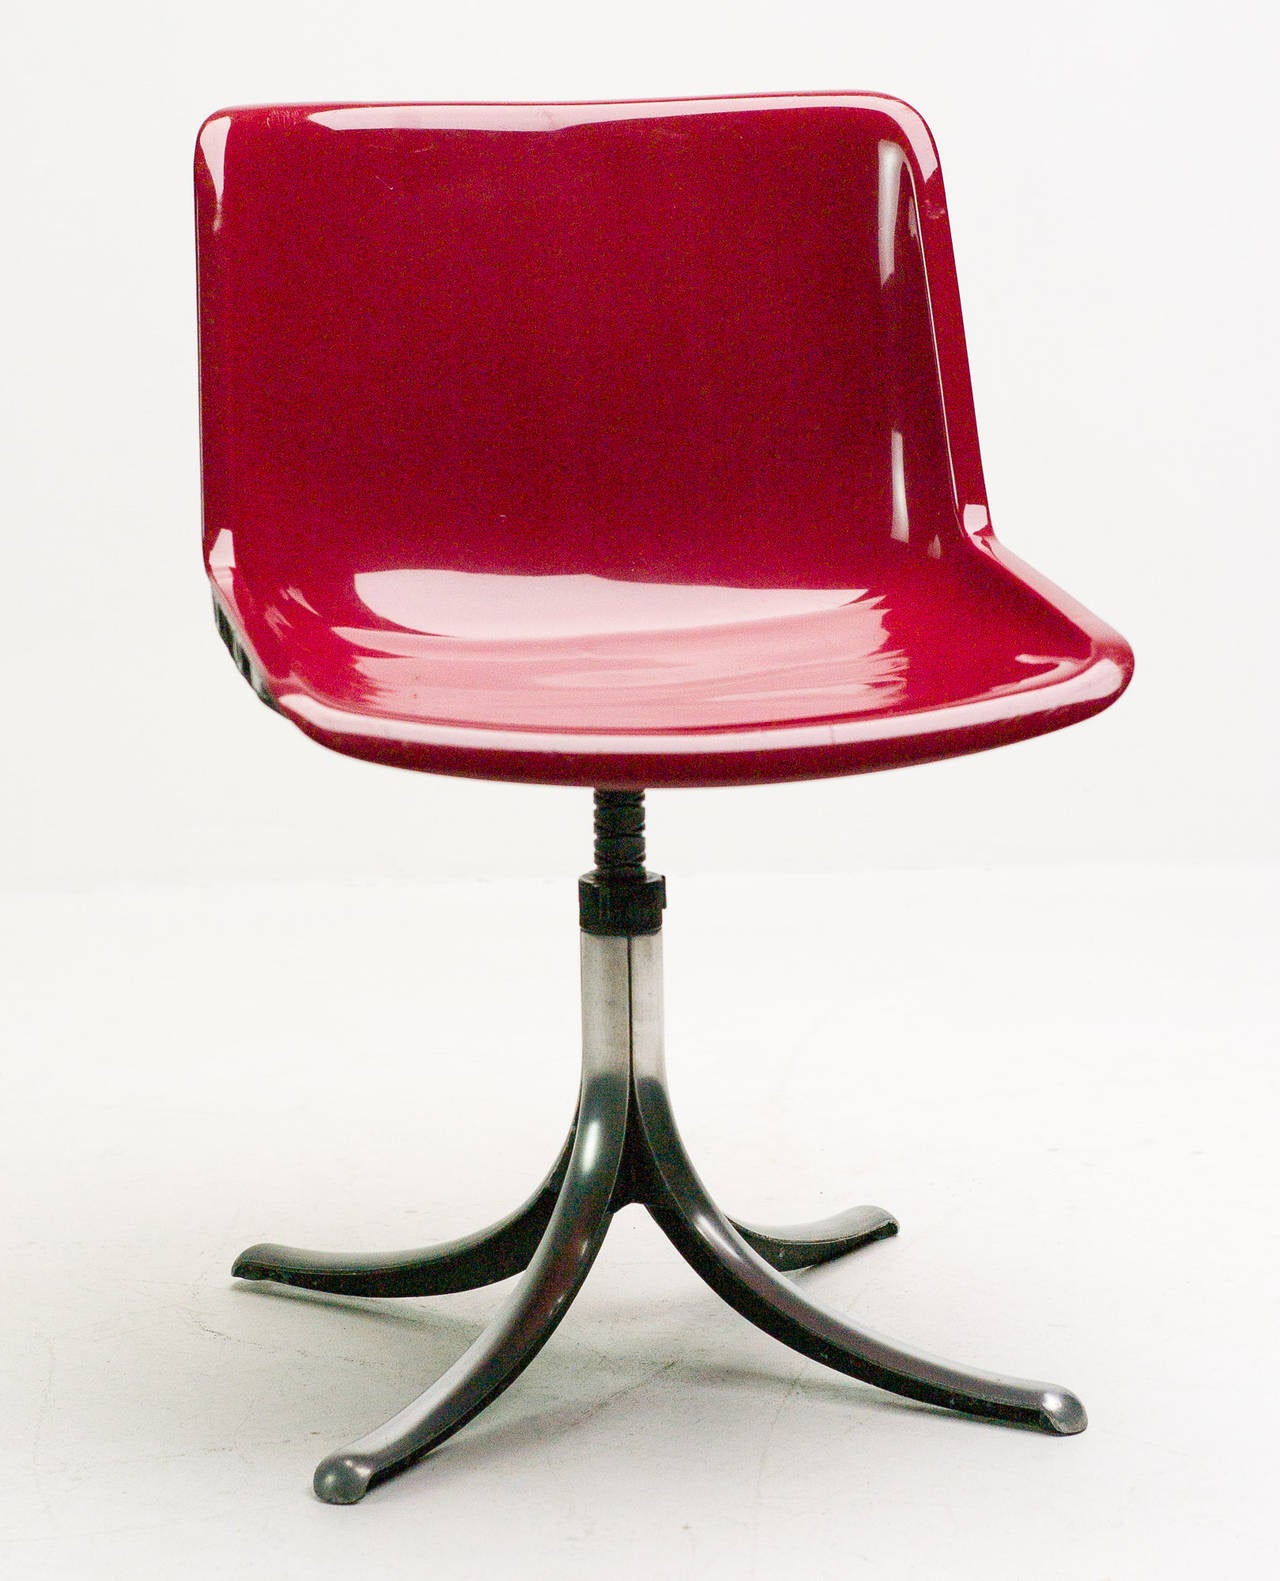 Set of Three Tecno Modus Chairs Designed by Osvaldo Borsani 2